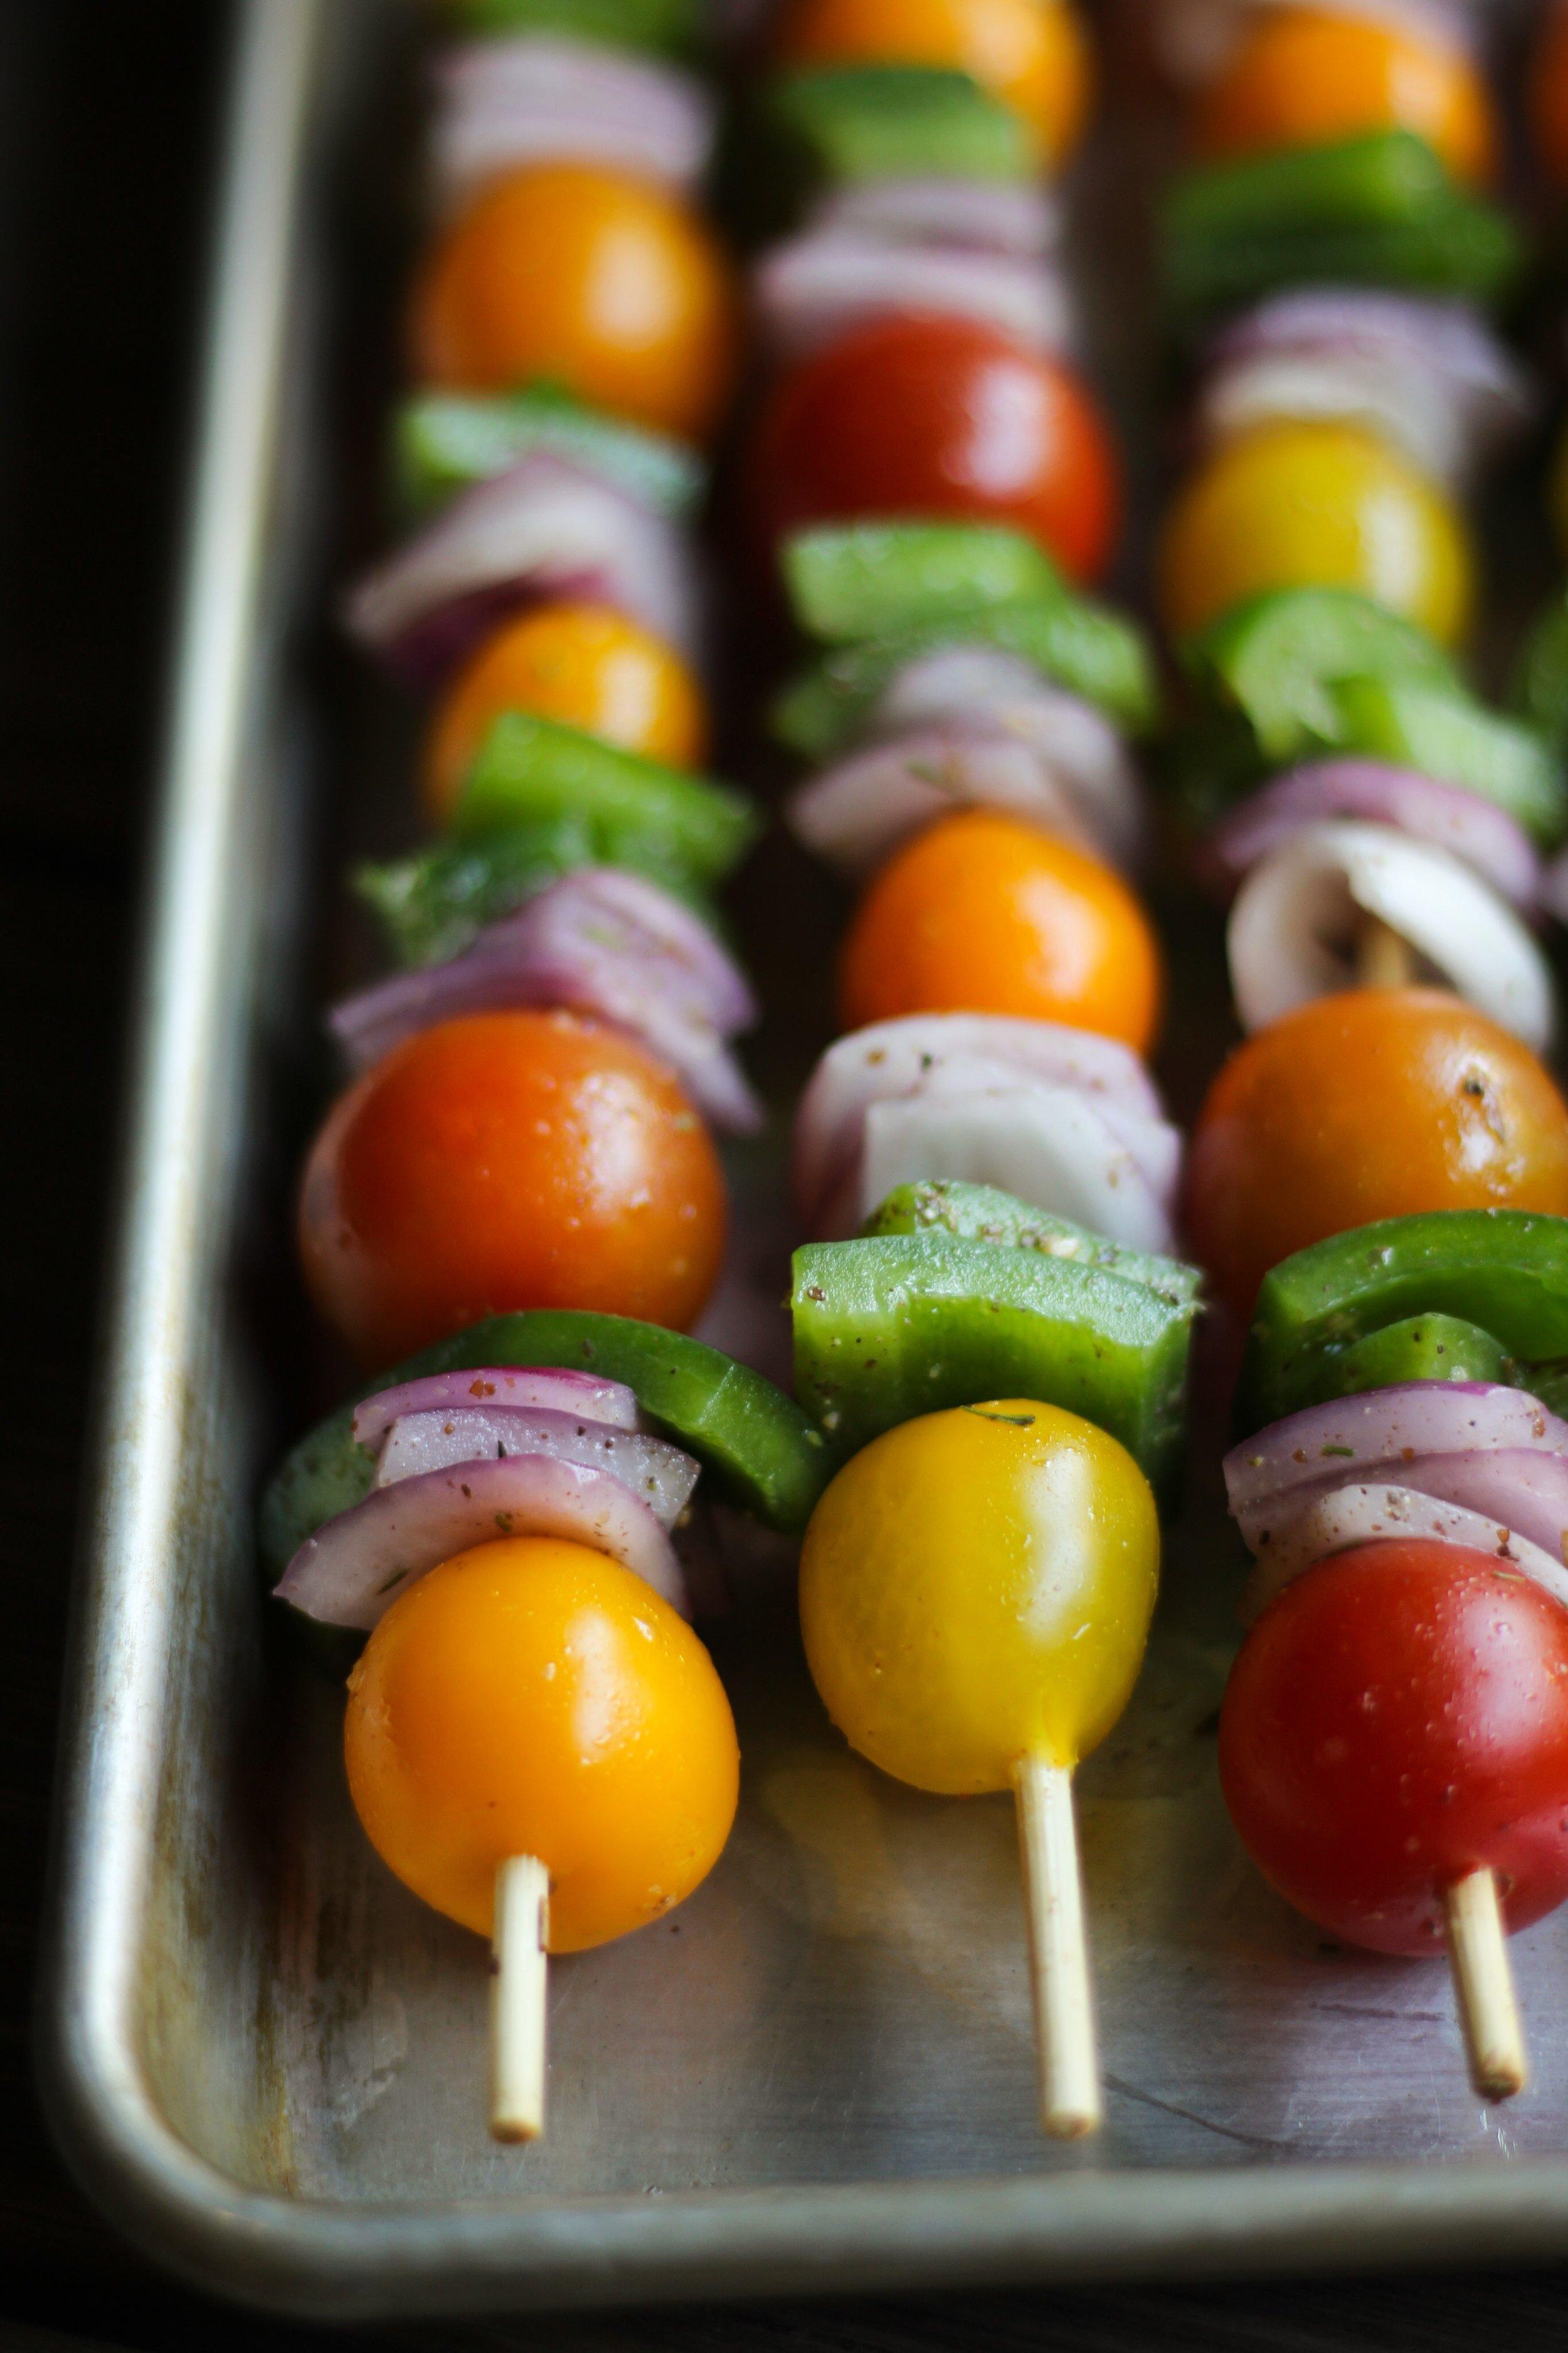 red onion, tomato, bell pepper shish kebab